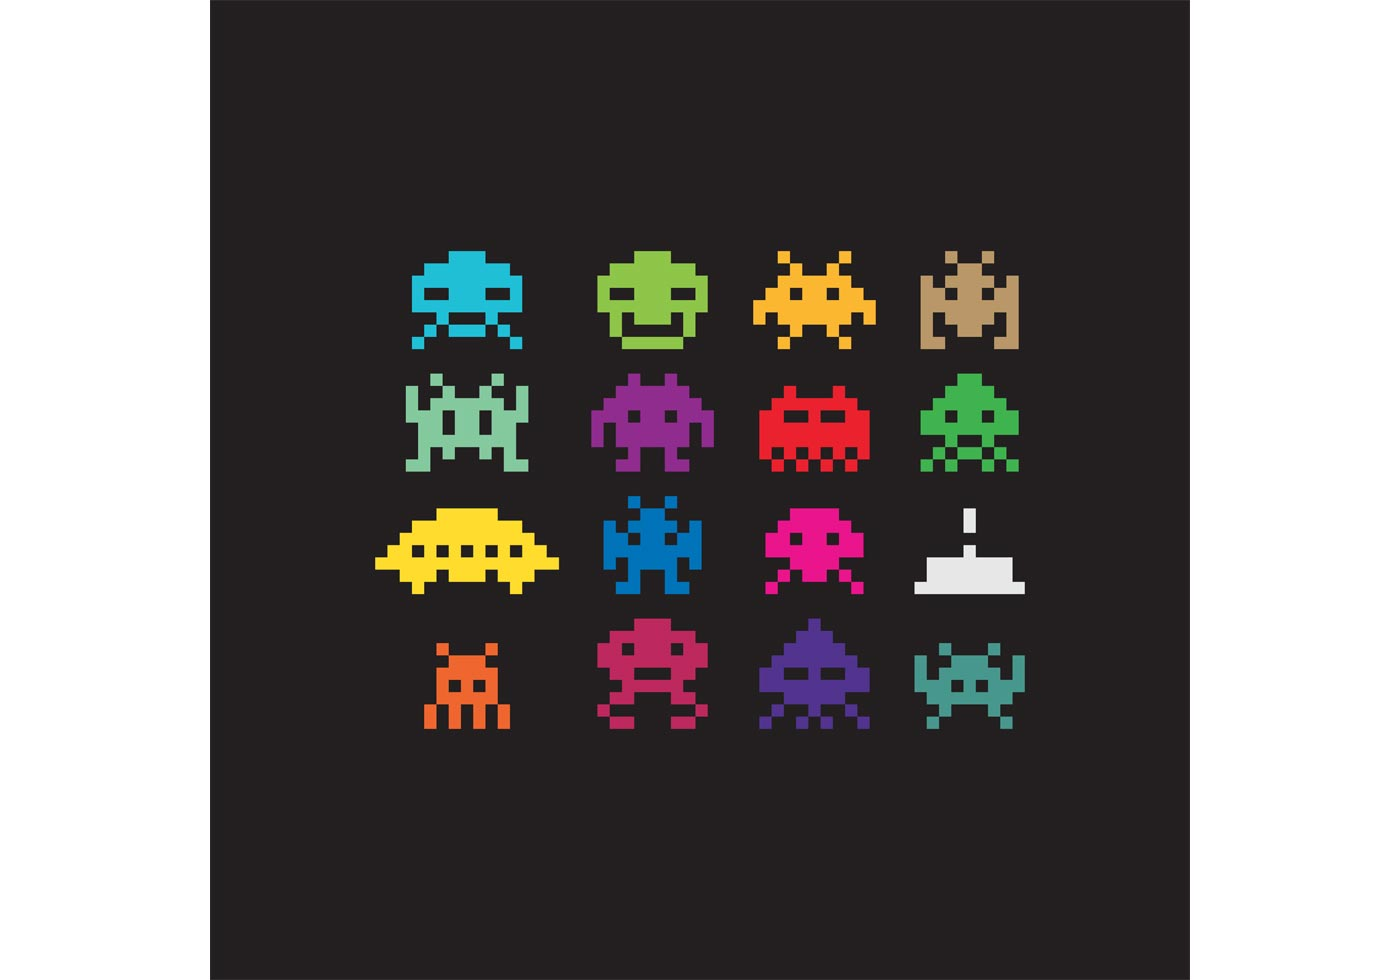 Pixel Vector Space Invaders - Download Free Vector Art ...  Space Invaders Spaceship